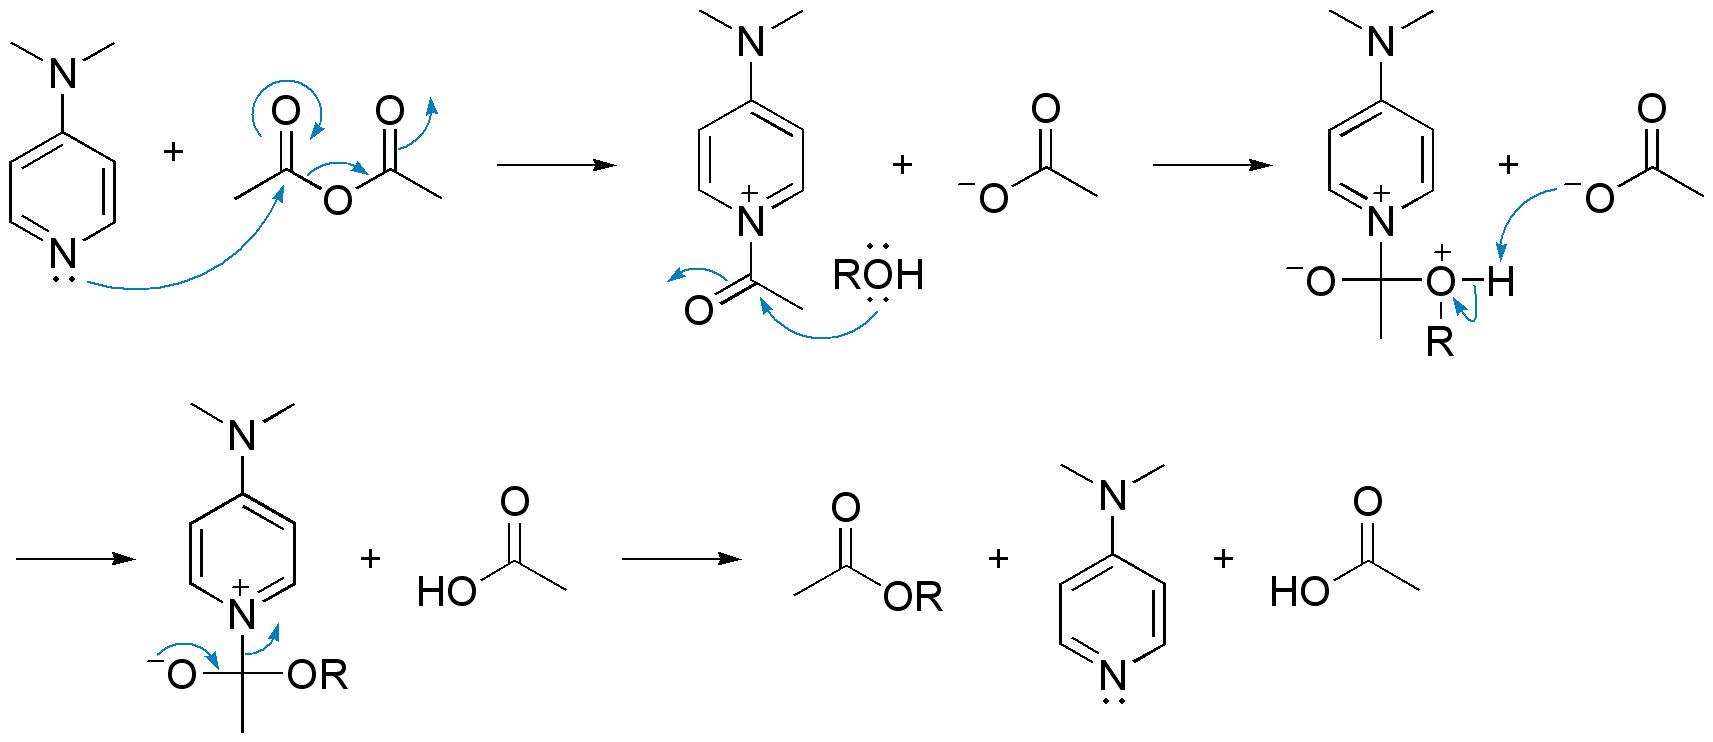 Friedel Crafts Acylation Of Benzene Pyridine Purpose